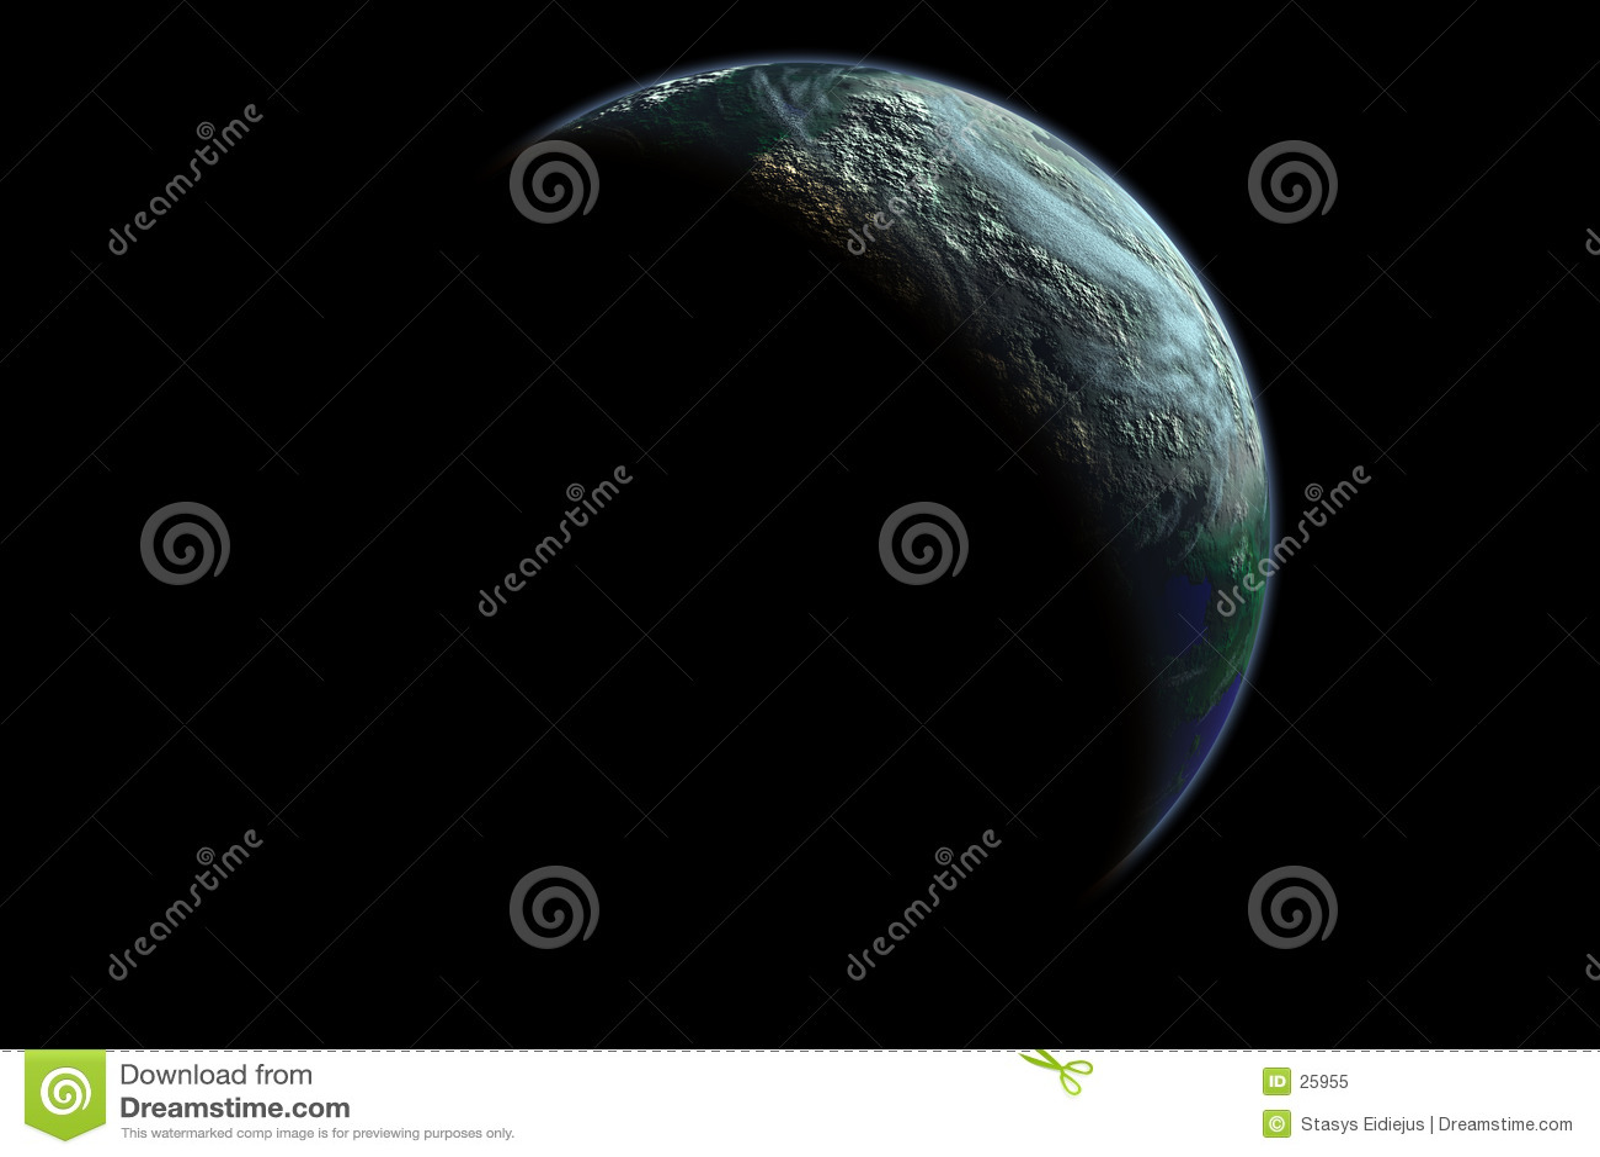 Earth planet at dawn